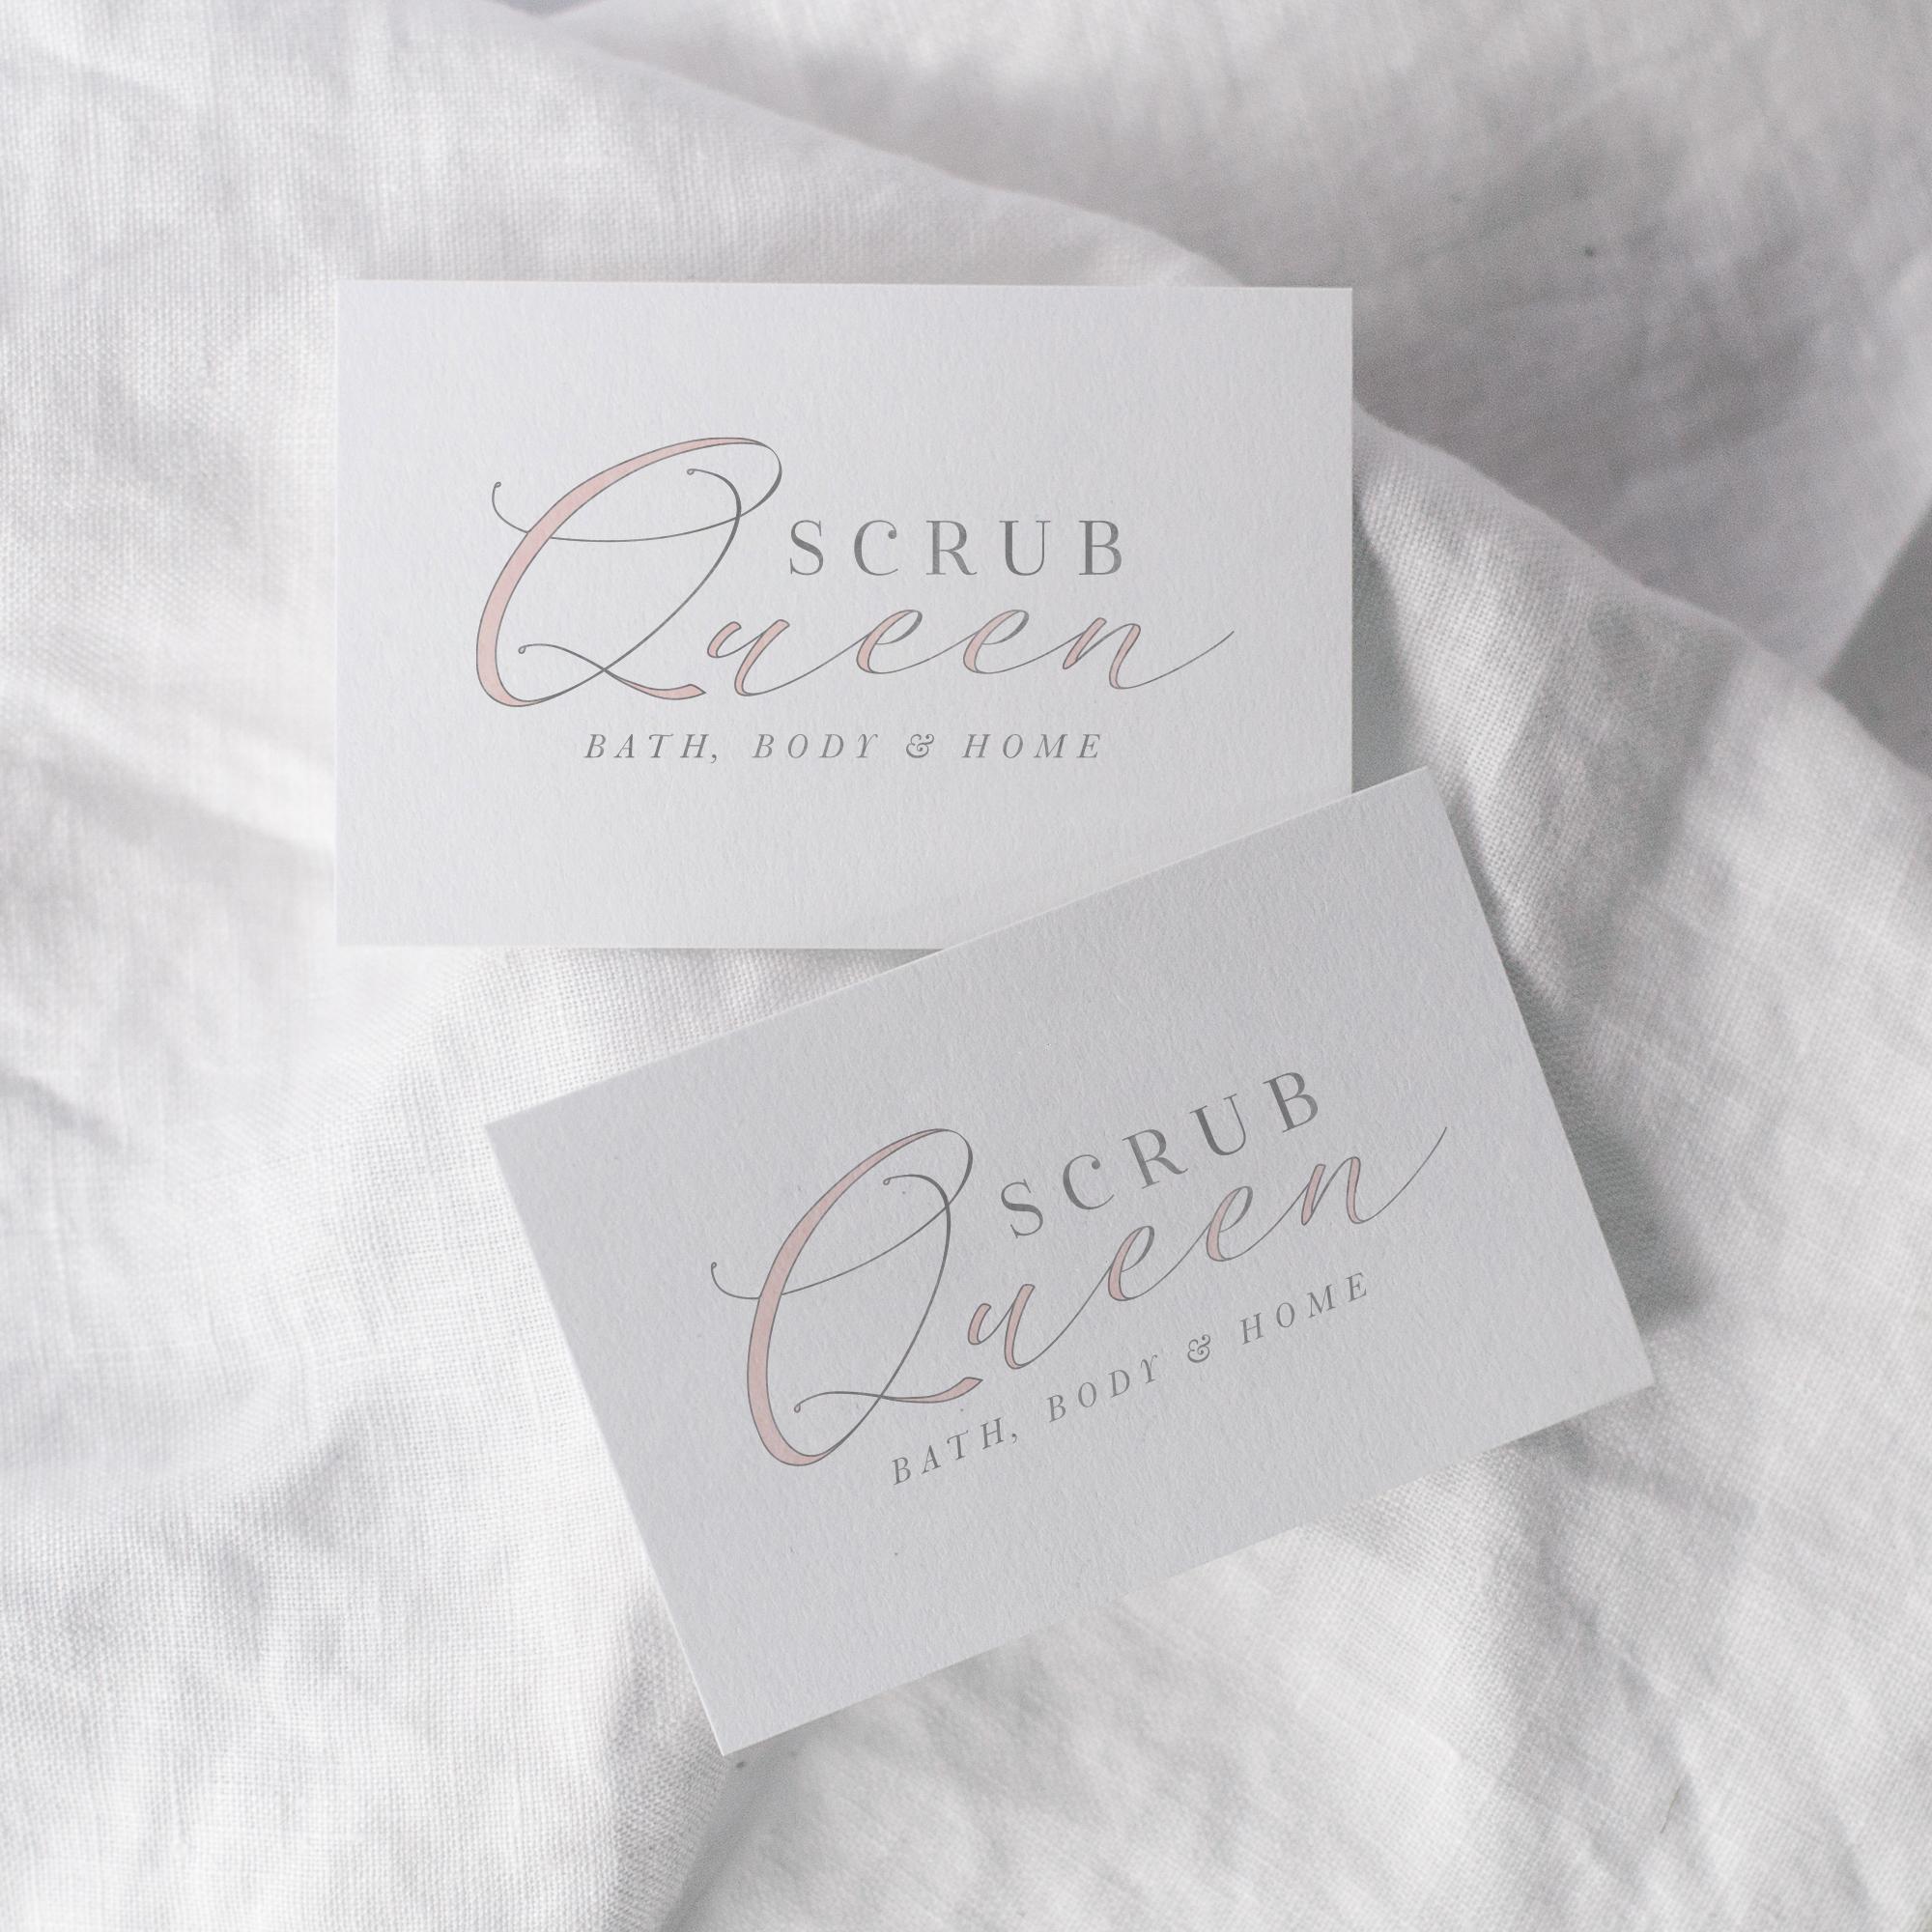 Scrub Queen | Branding